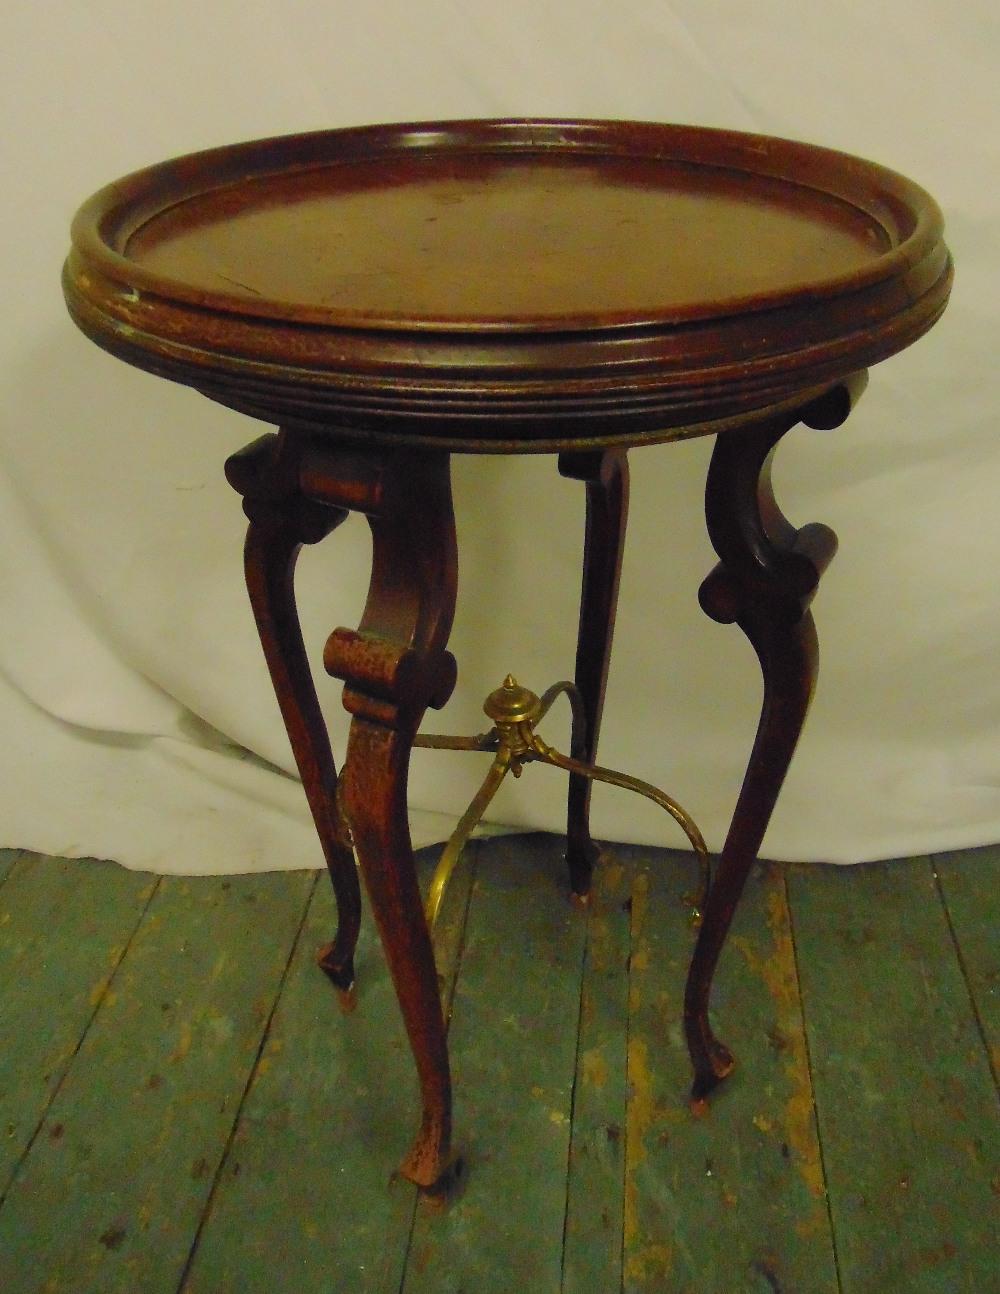 Lot 19 - A mahogany circular side table on four cabriole legs, 61 x 40cm